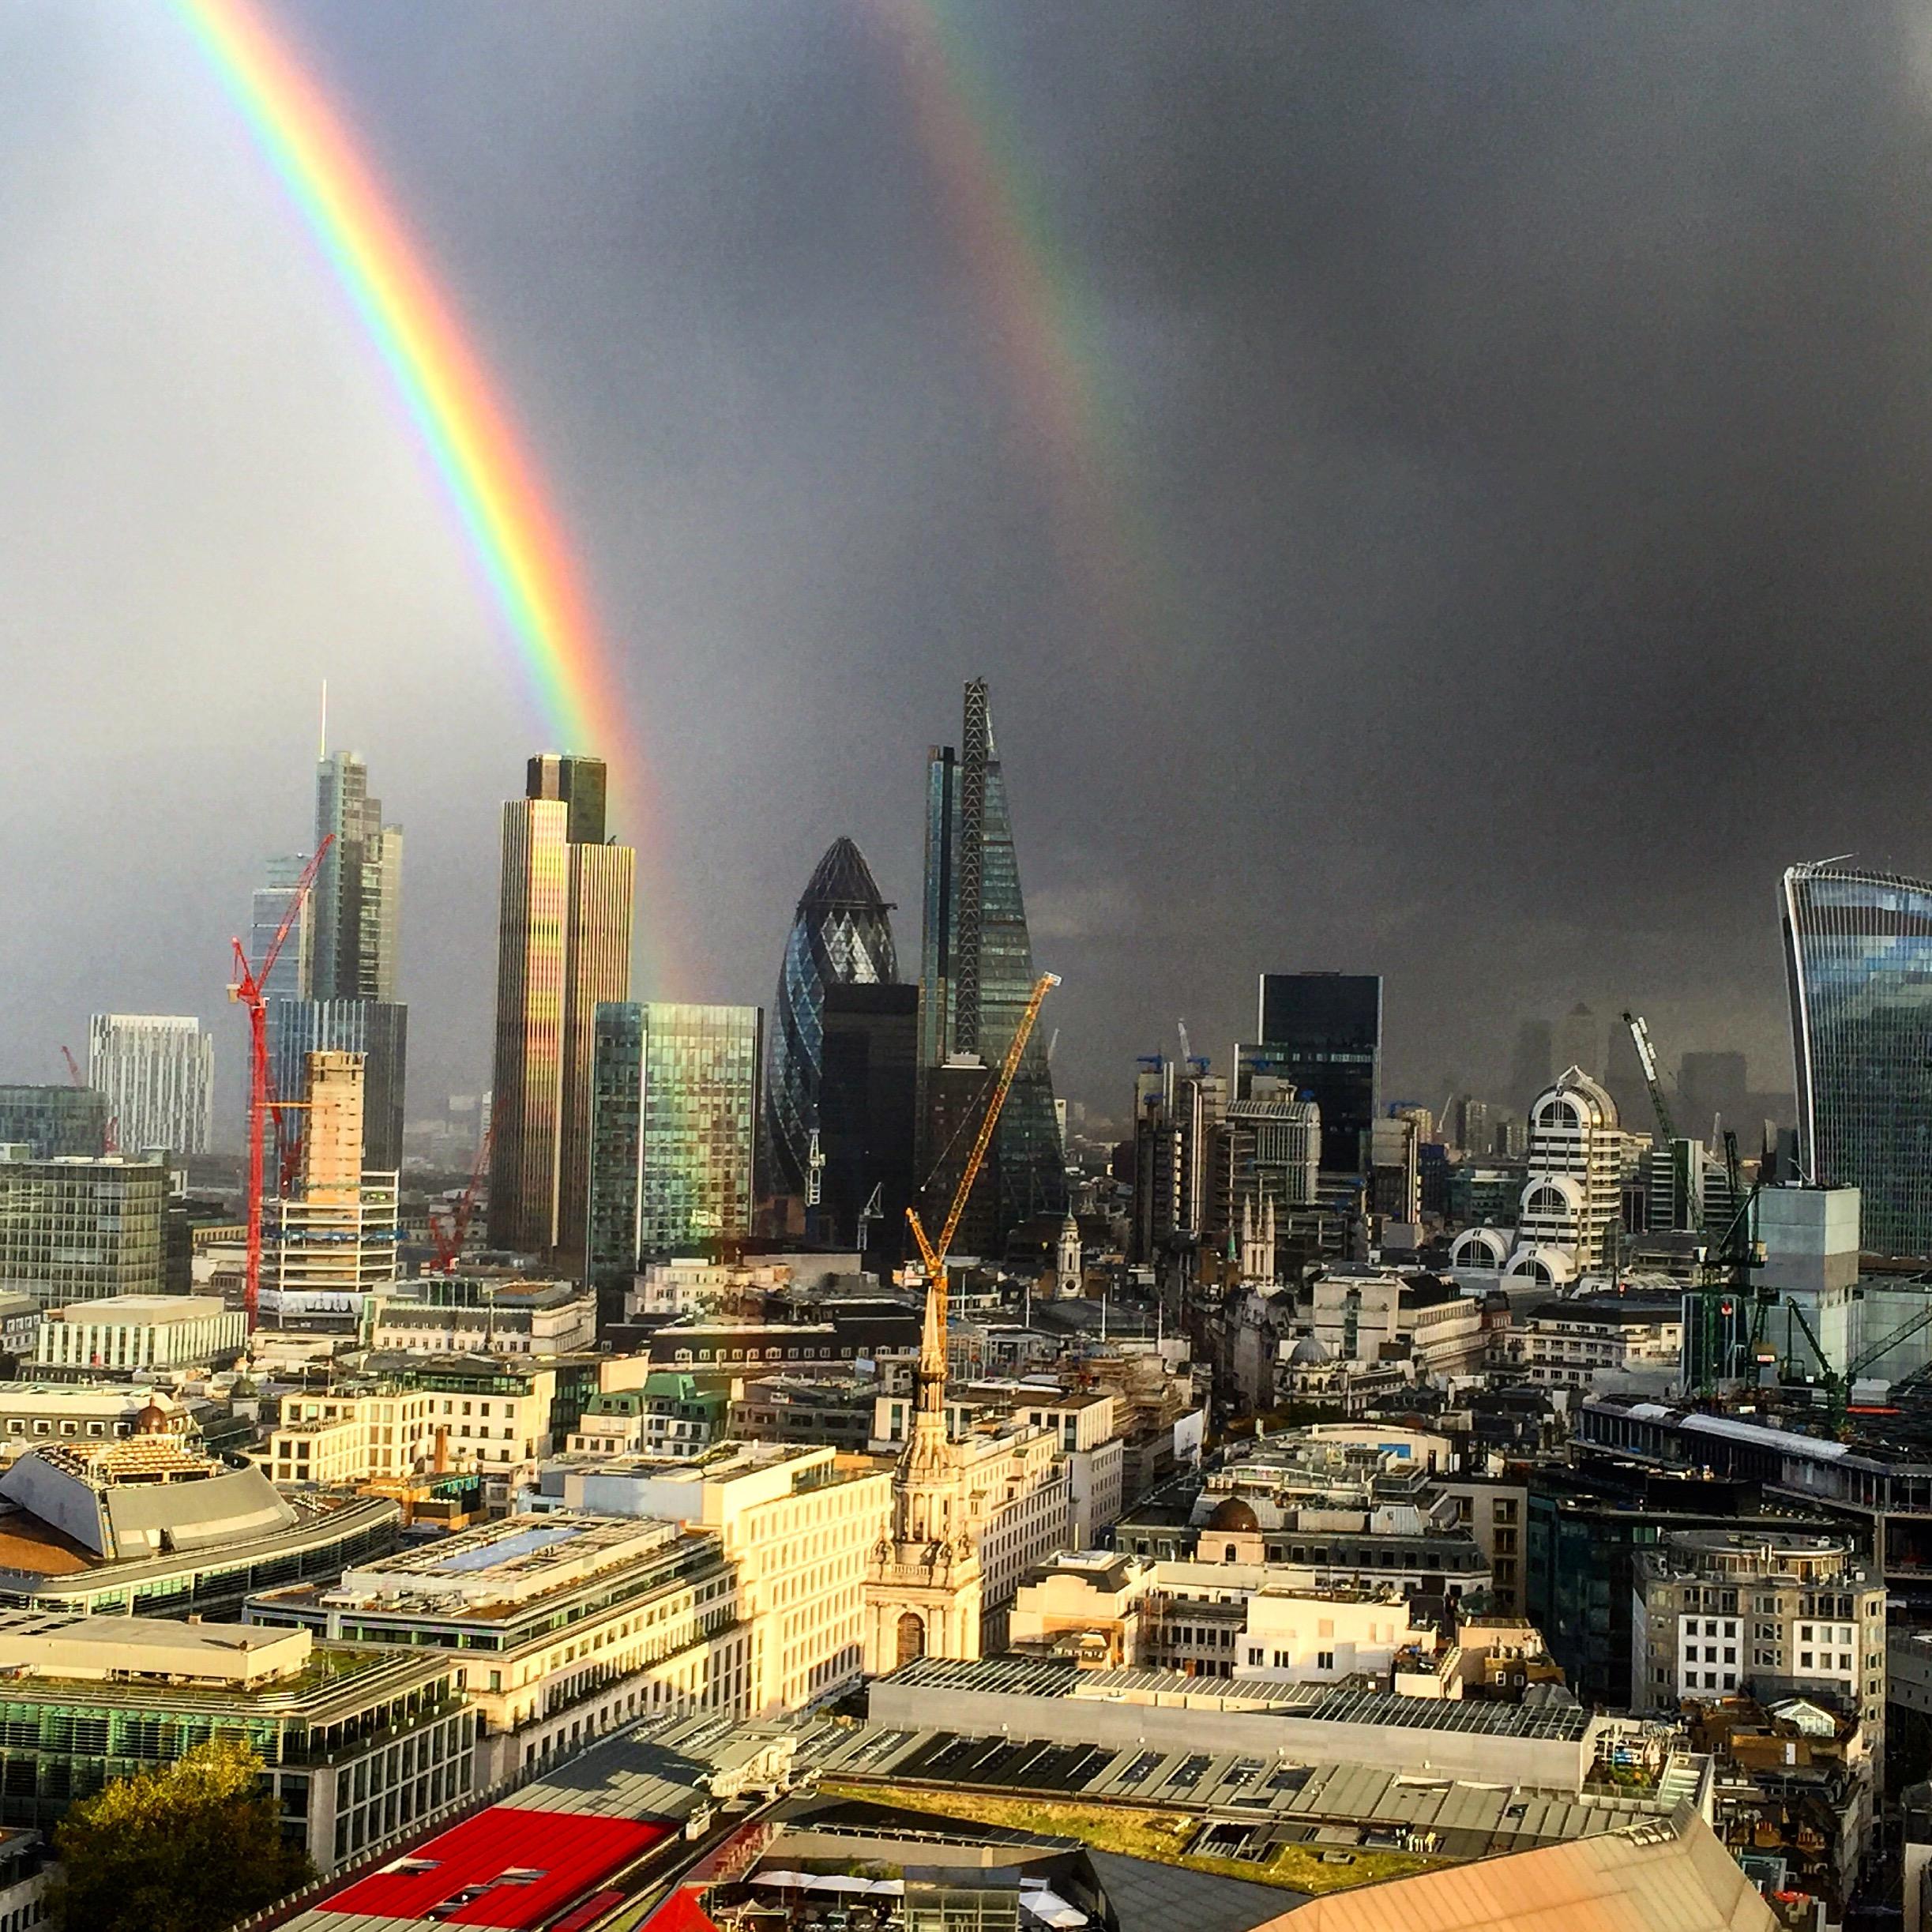 Duha nad City of London